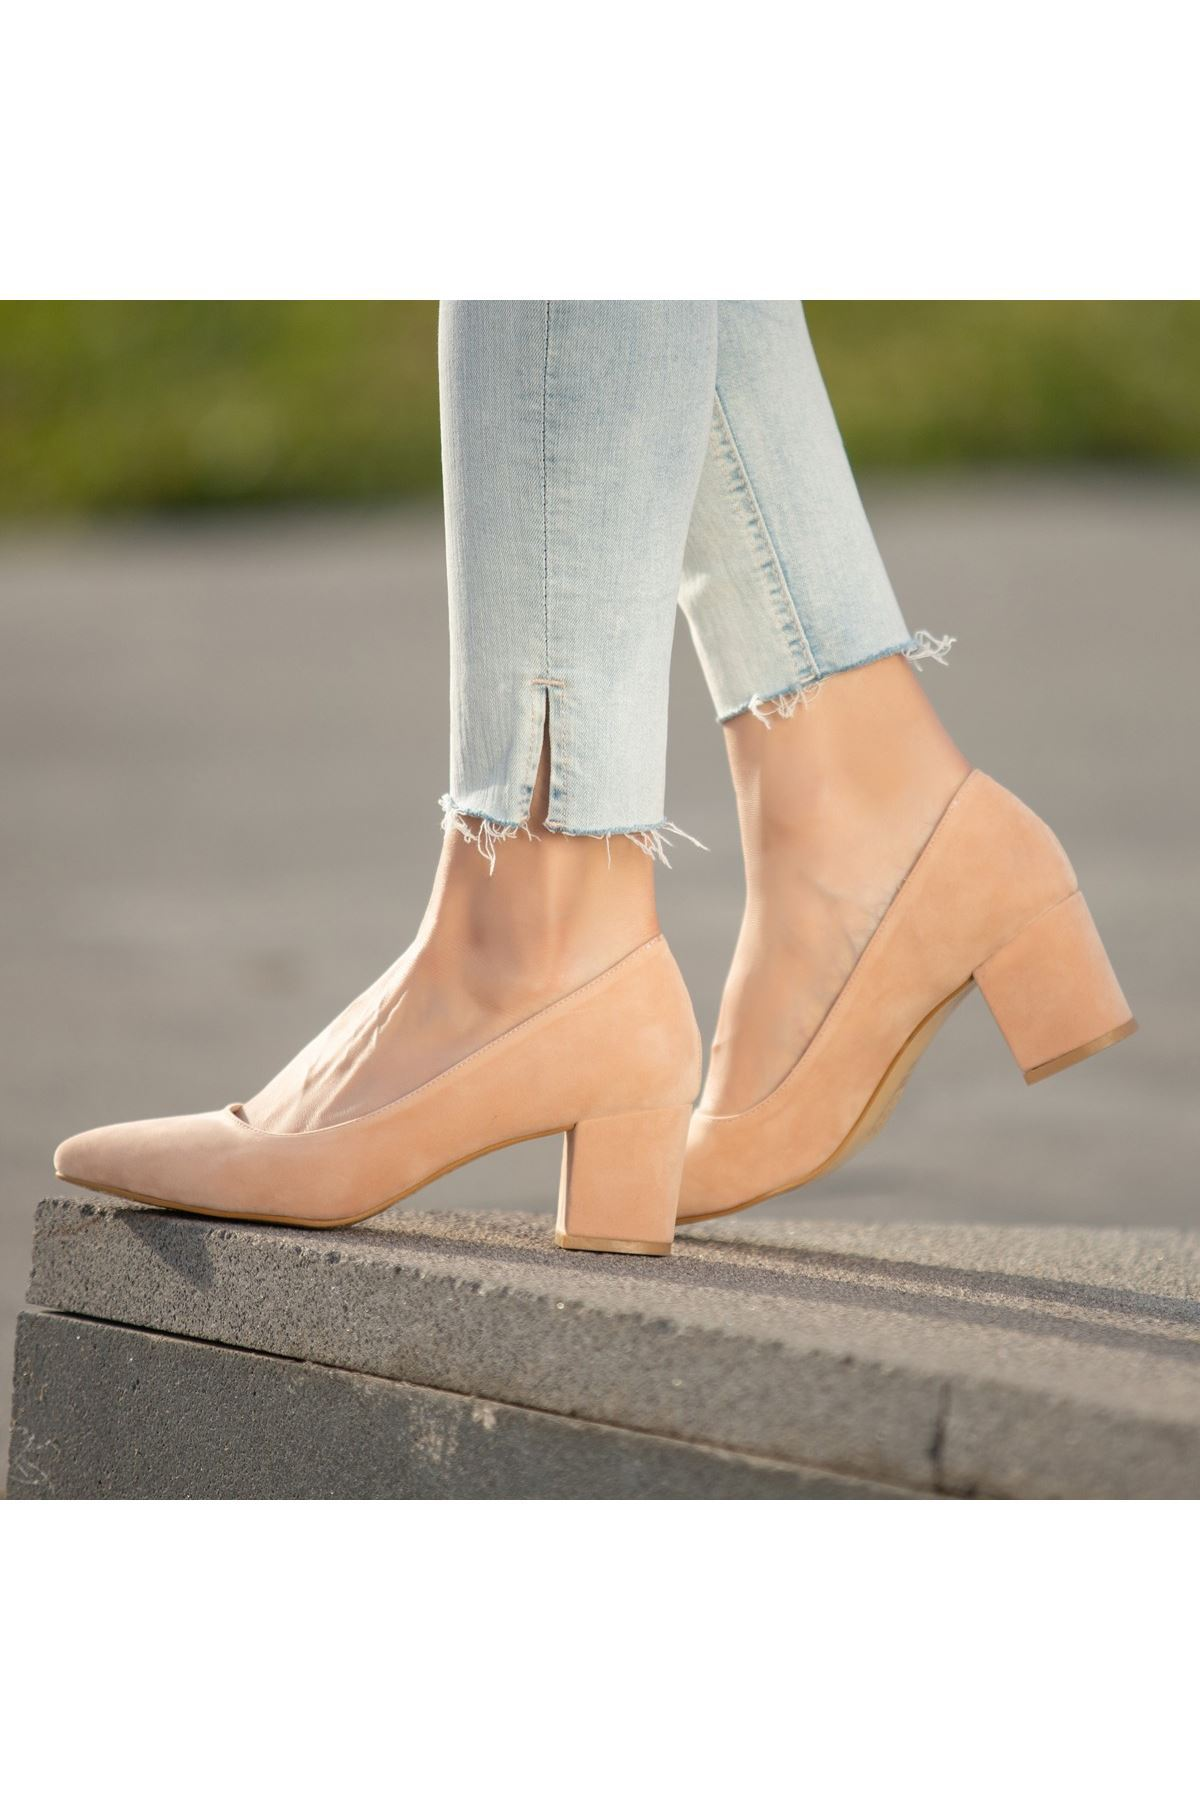 Yaw Pudra Süet Topuklu Ayakkabı